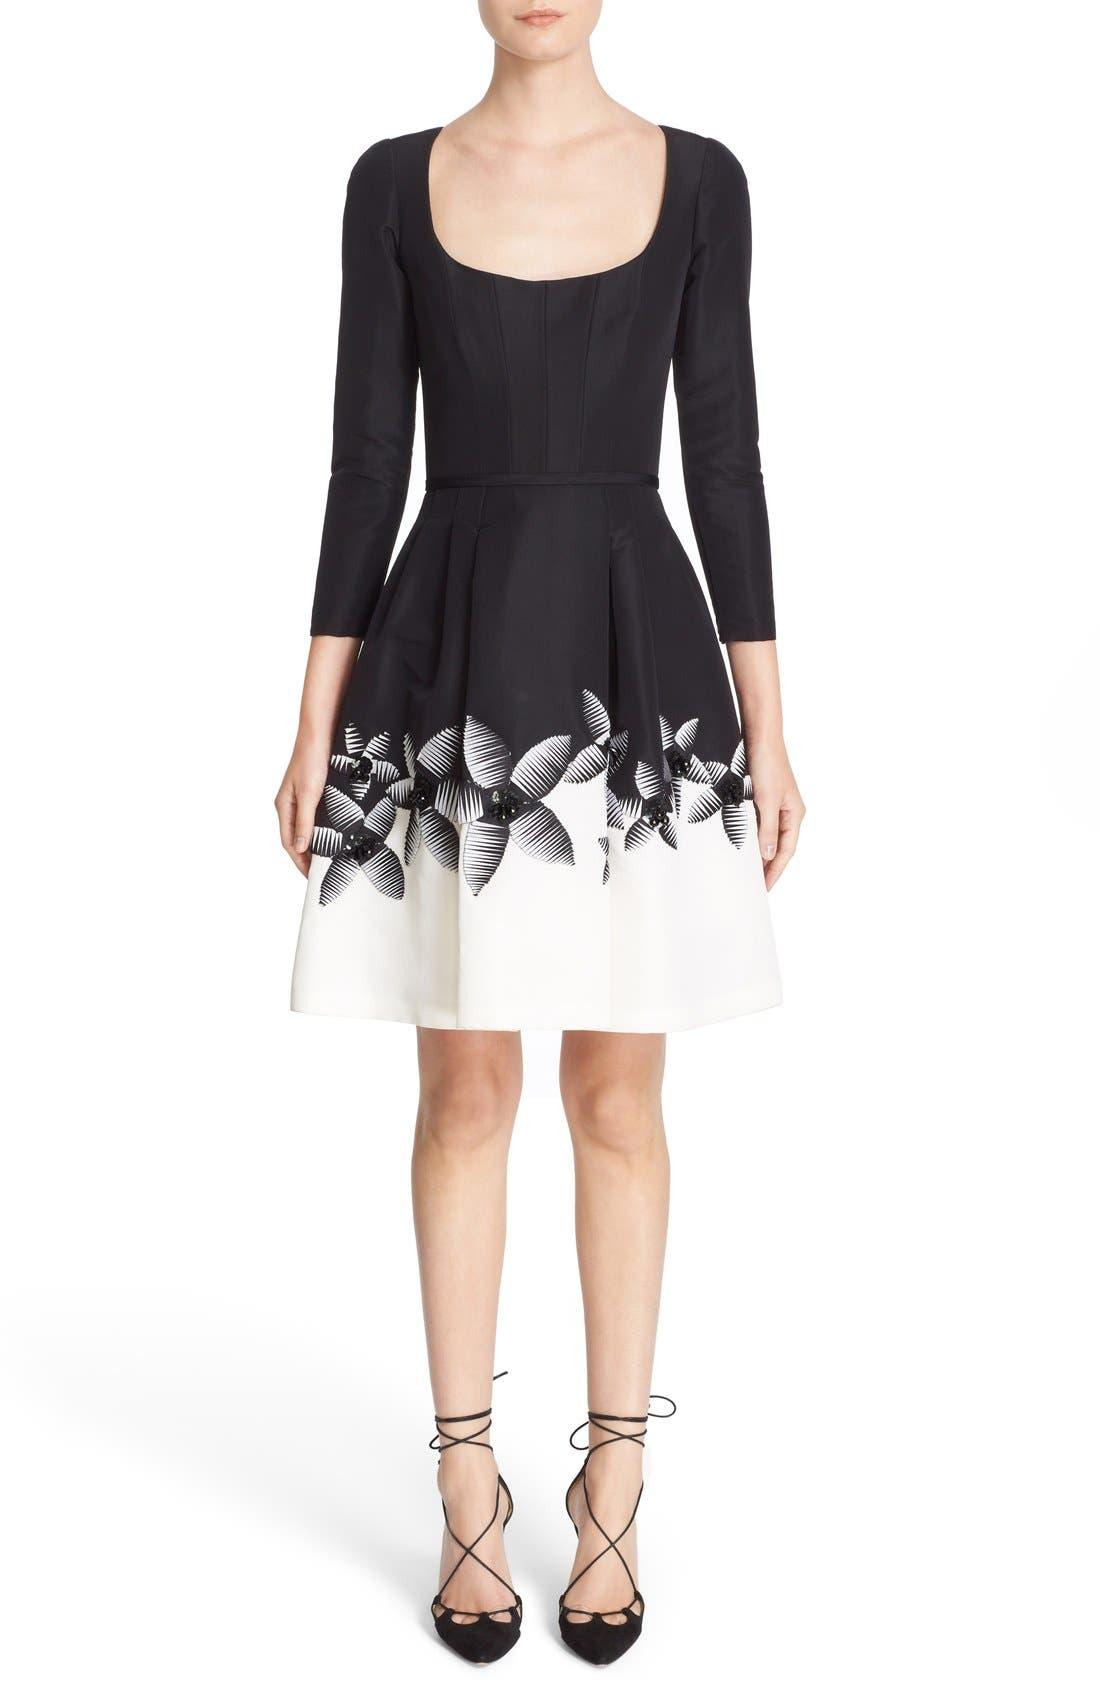 Alternate Image 1 Selected - Carolina Herrera Embellished Two-Tone Scoop Neck Faille Fit & Flare Dress